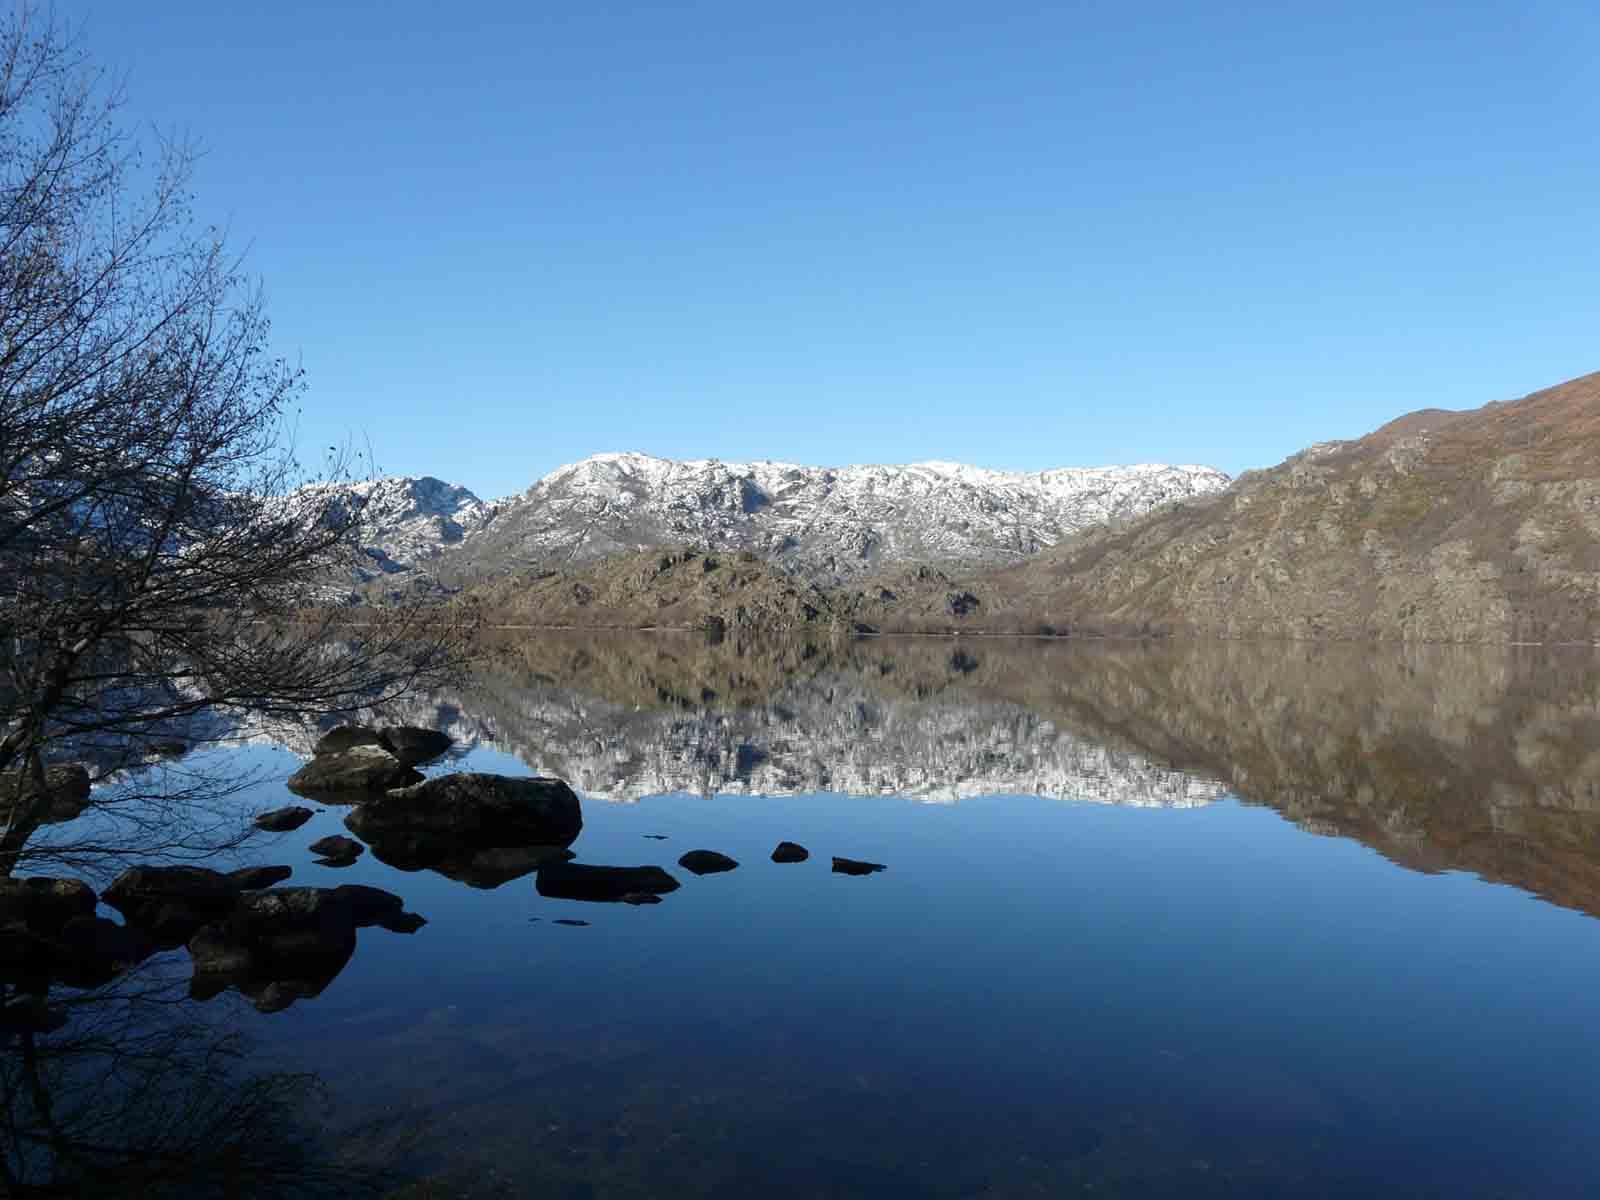 lago de sanabria_2